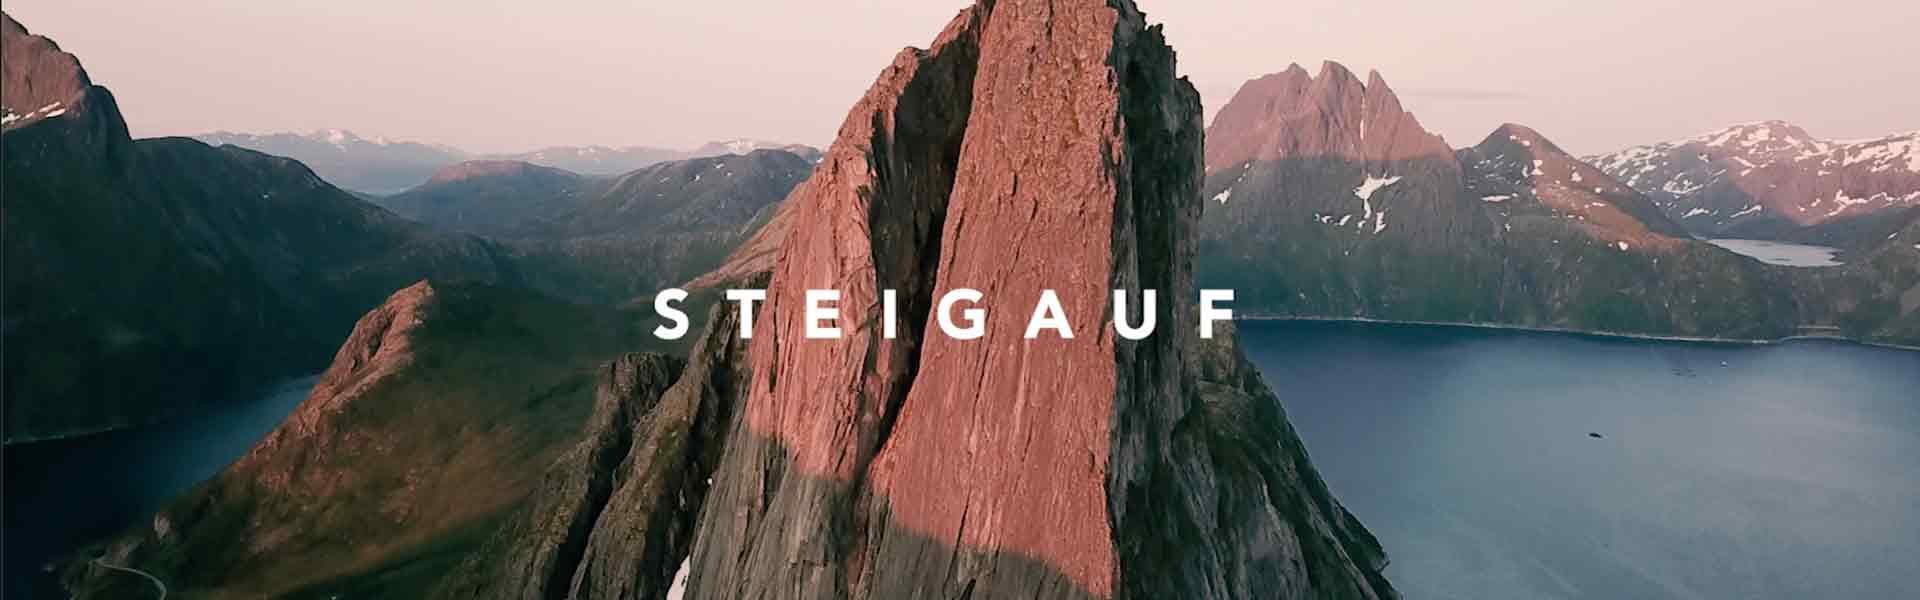 Bergsteiger - Imagefilm